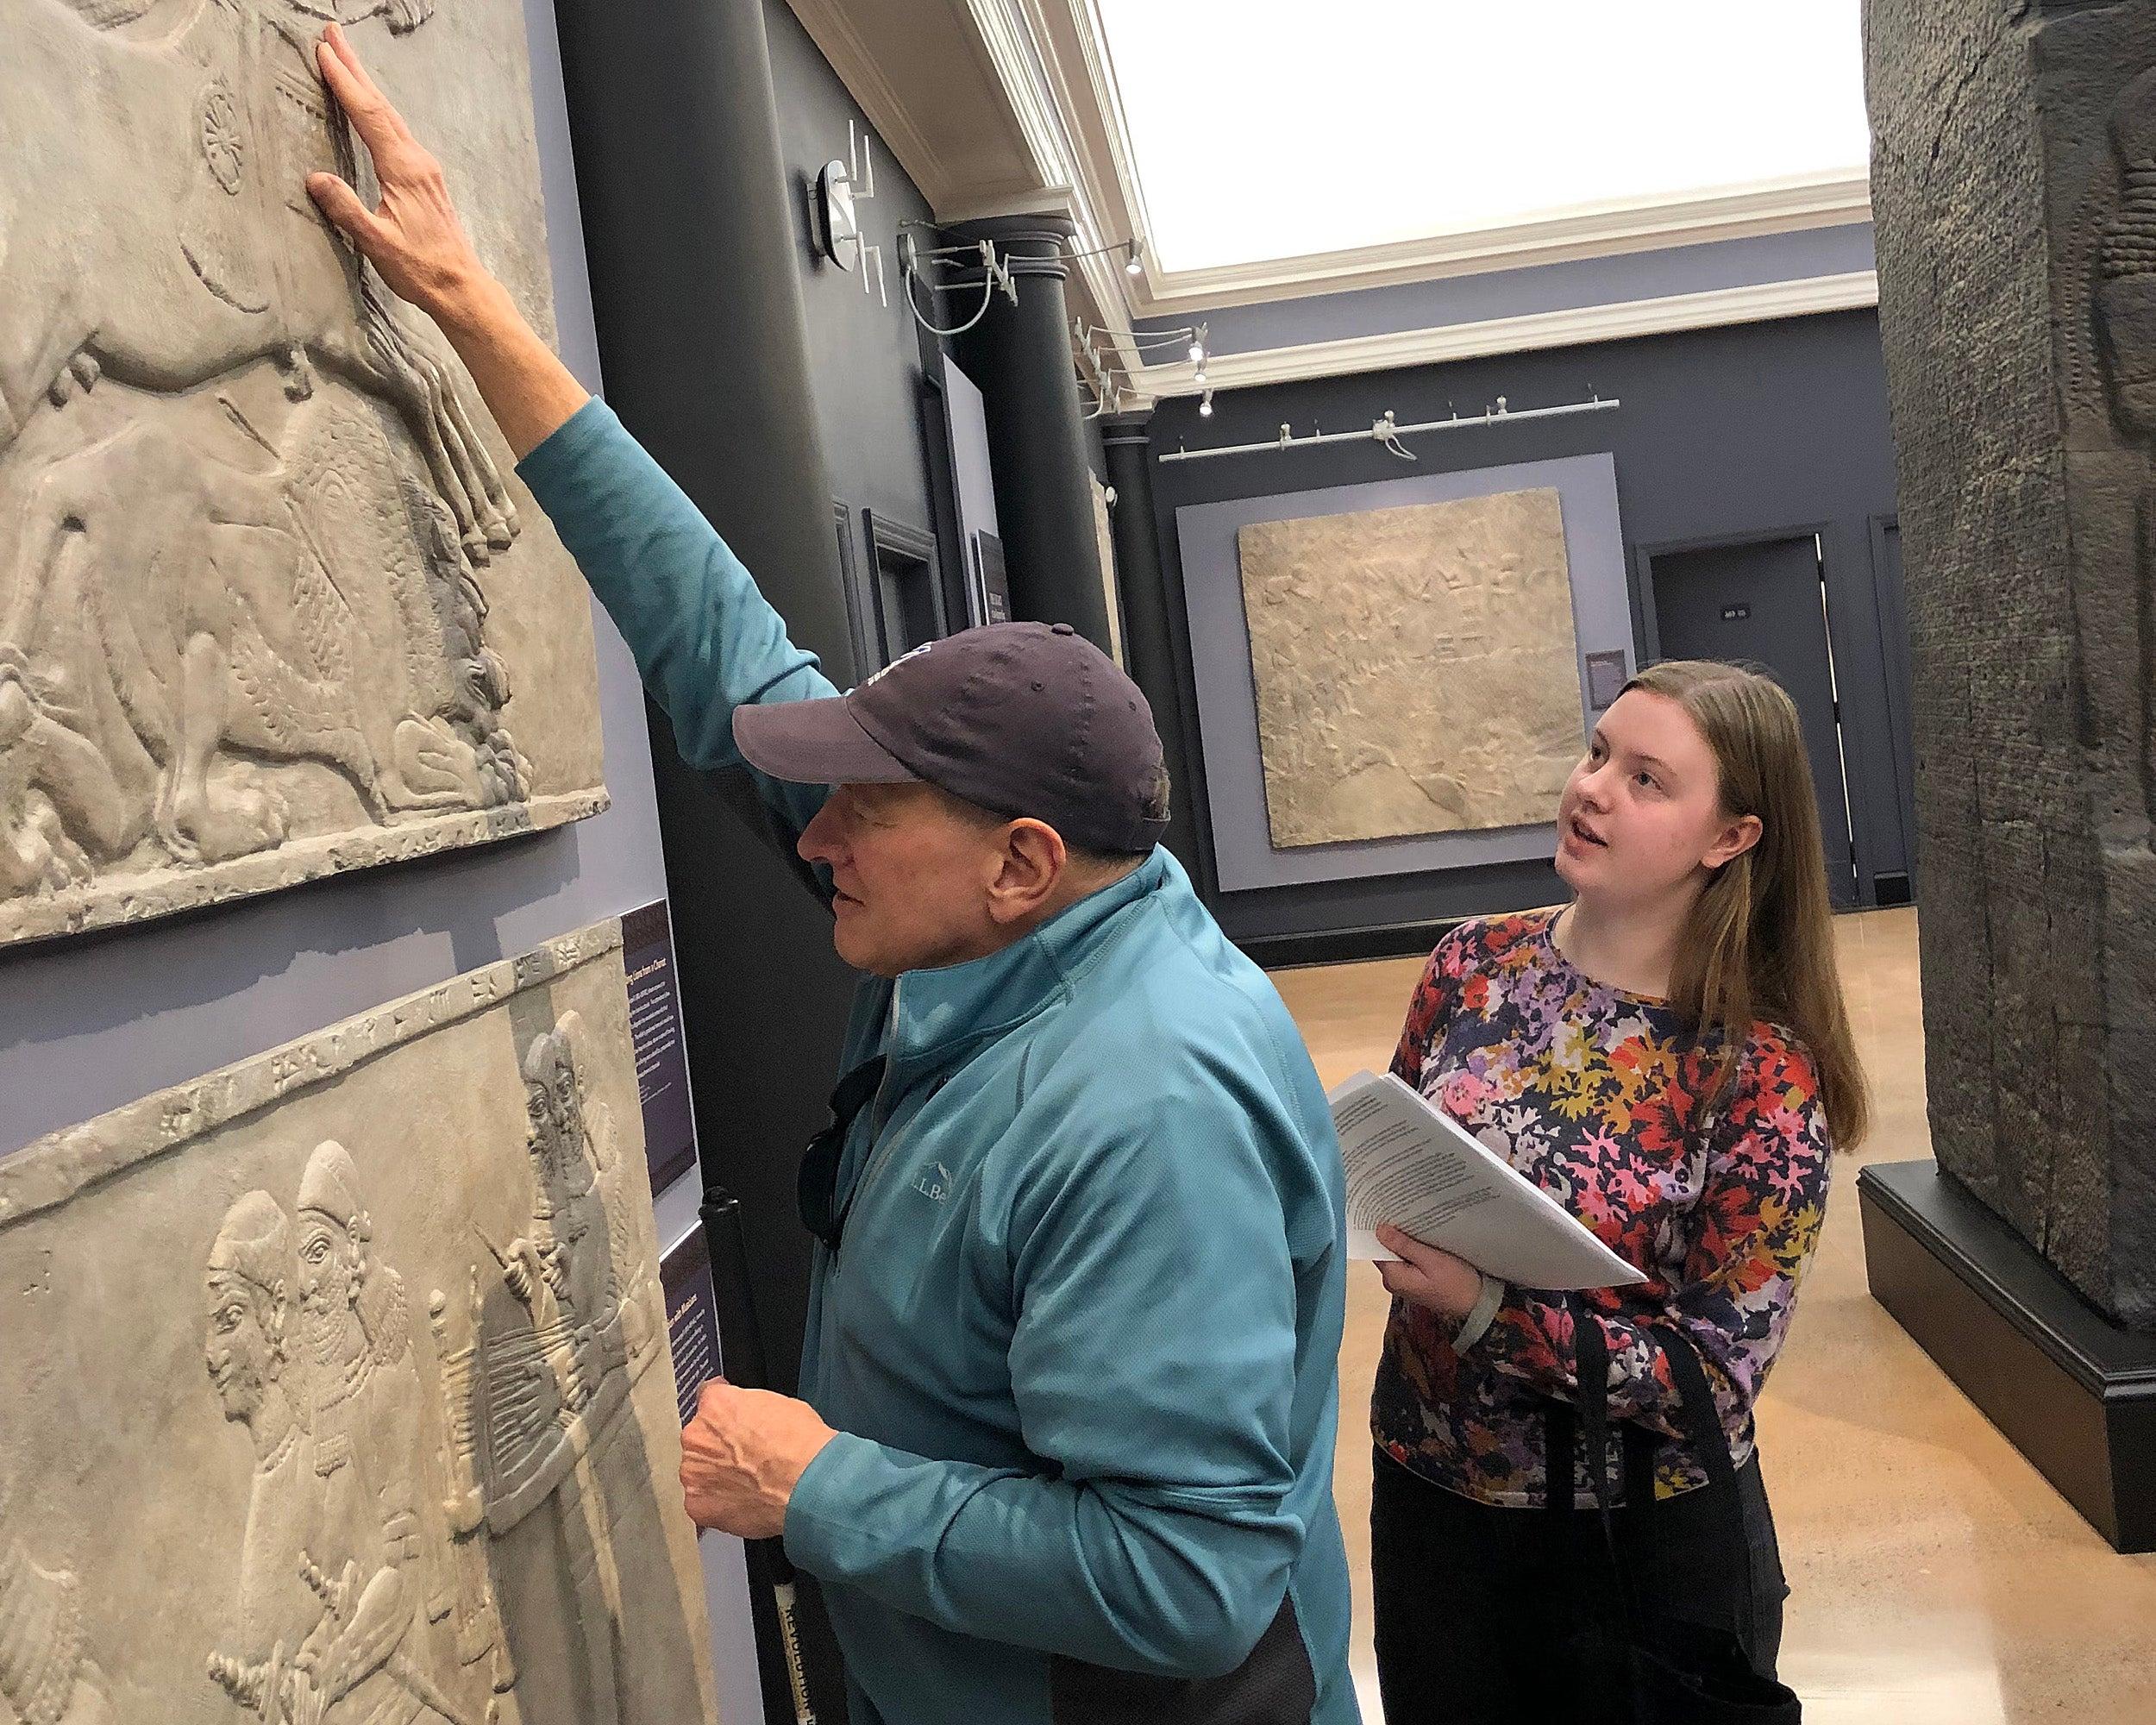 Visitor touches exhibit piece.